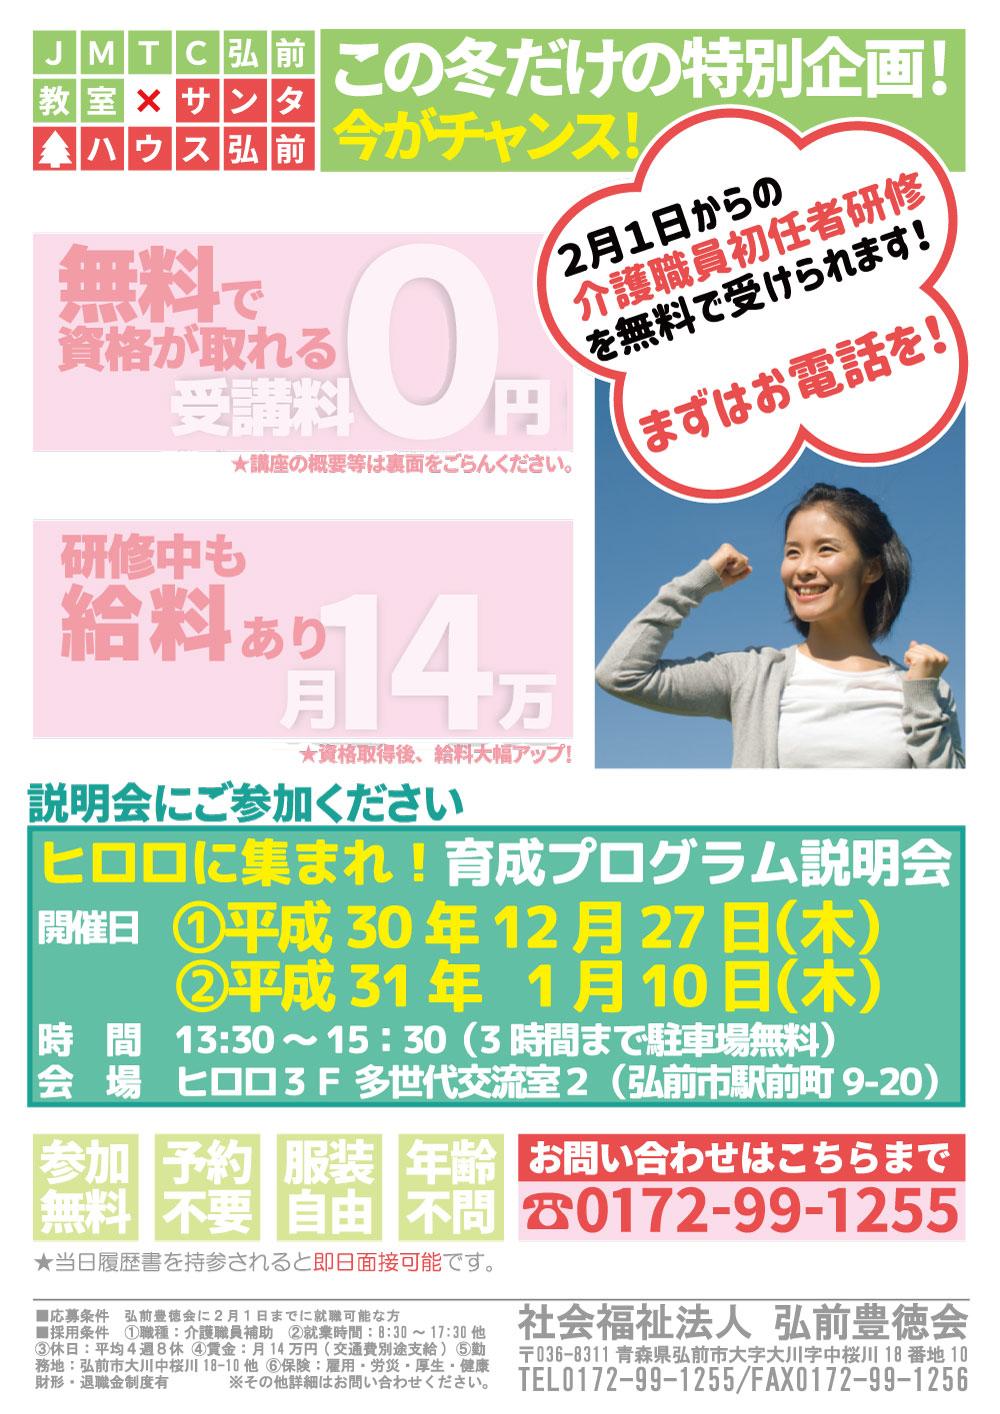 JMTC弘前教室×サンタハウス弘前 特別コラボ企画!